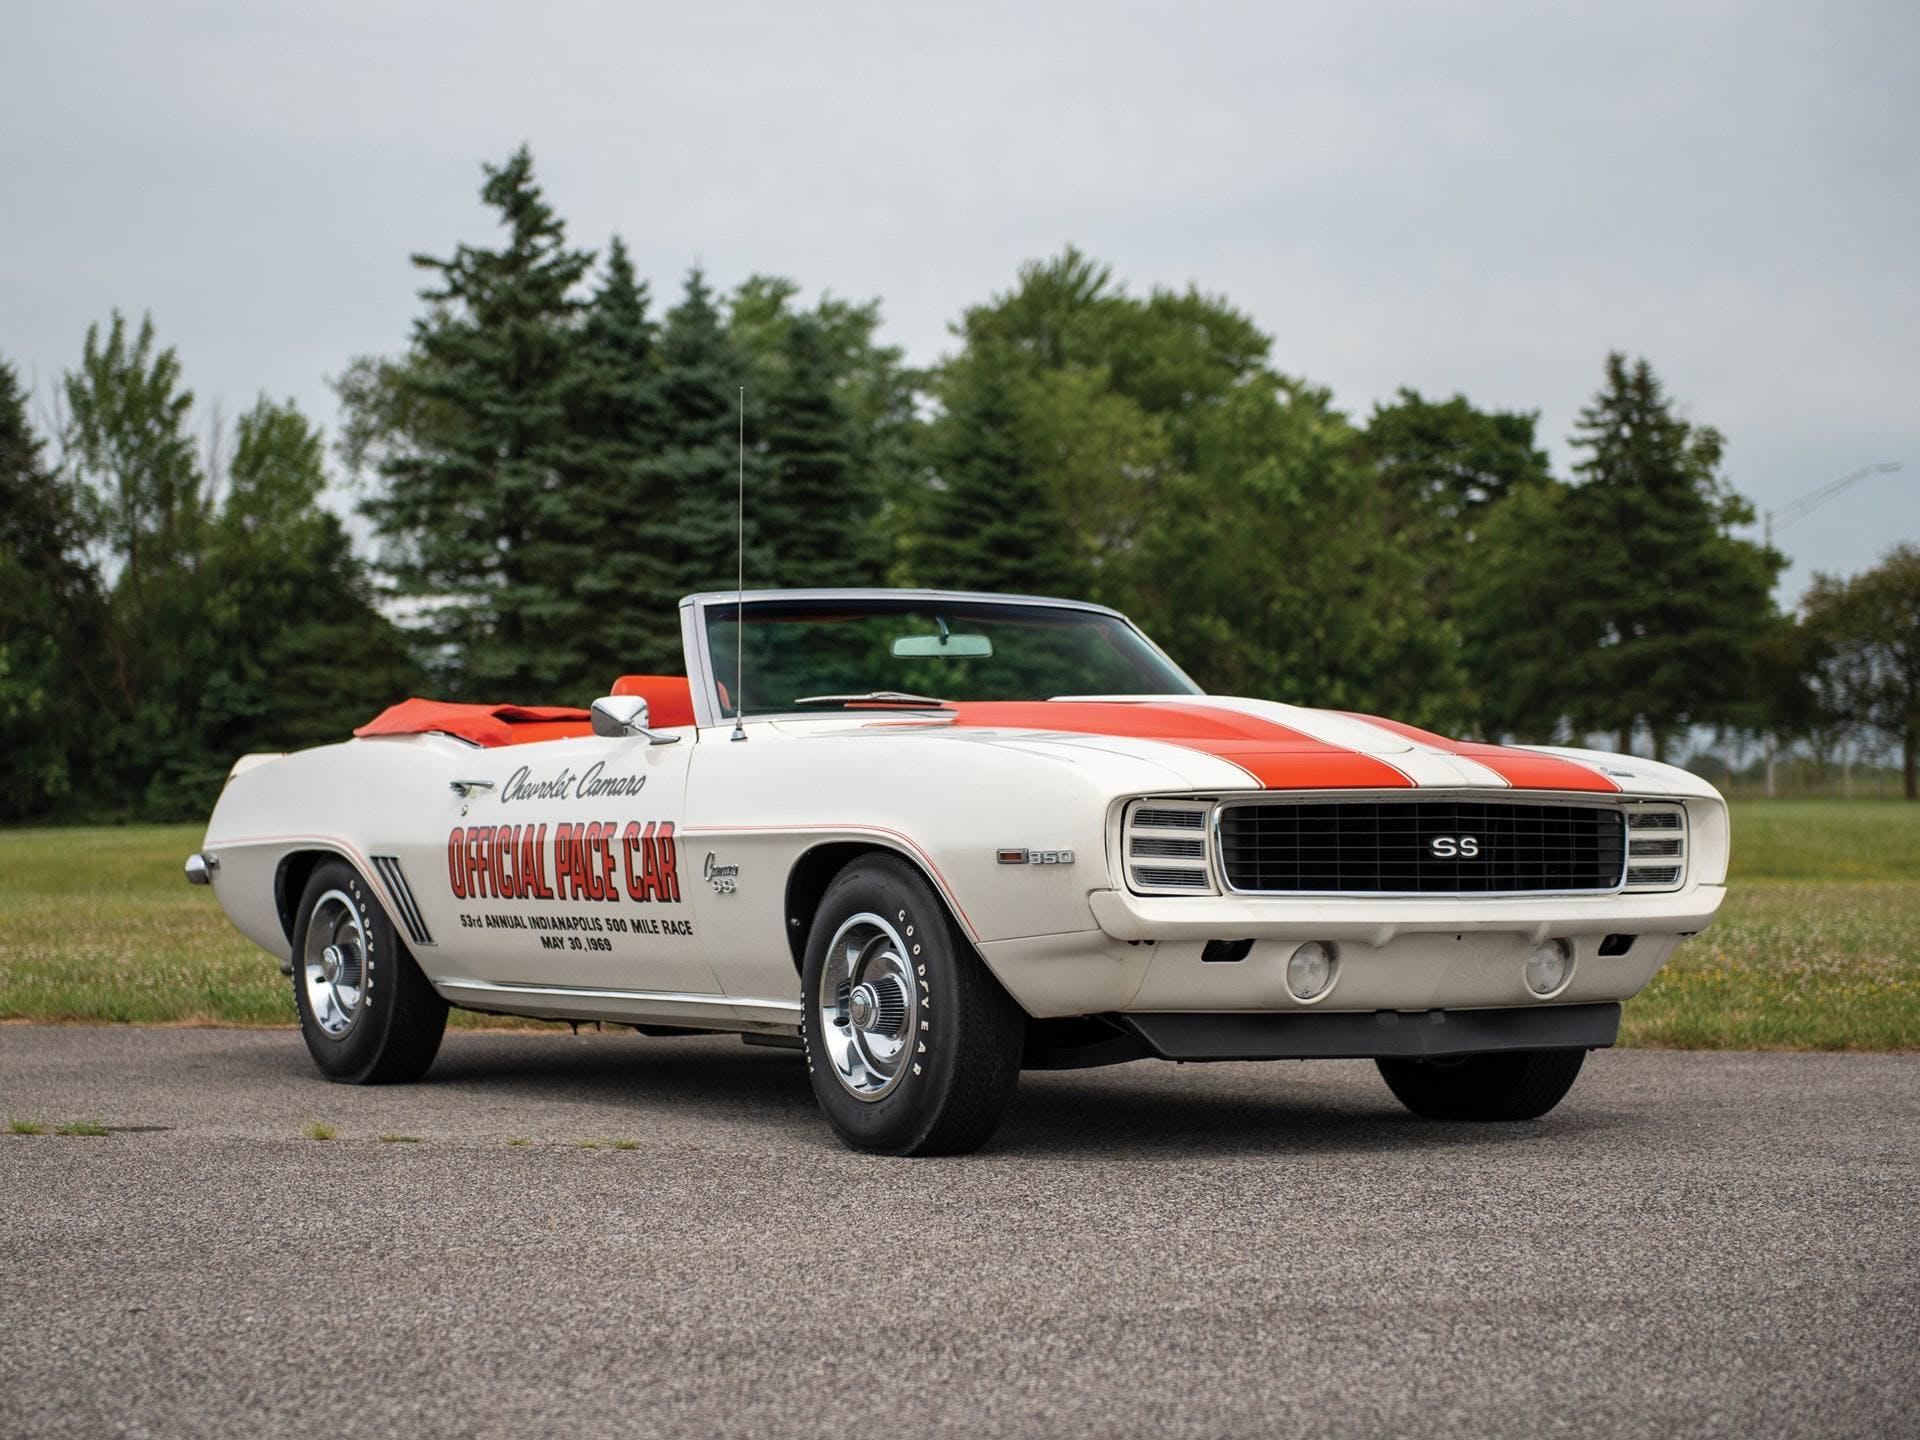 1969 Chevrolet Camaro Indy 500 Pace Car Replica